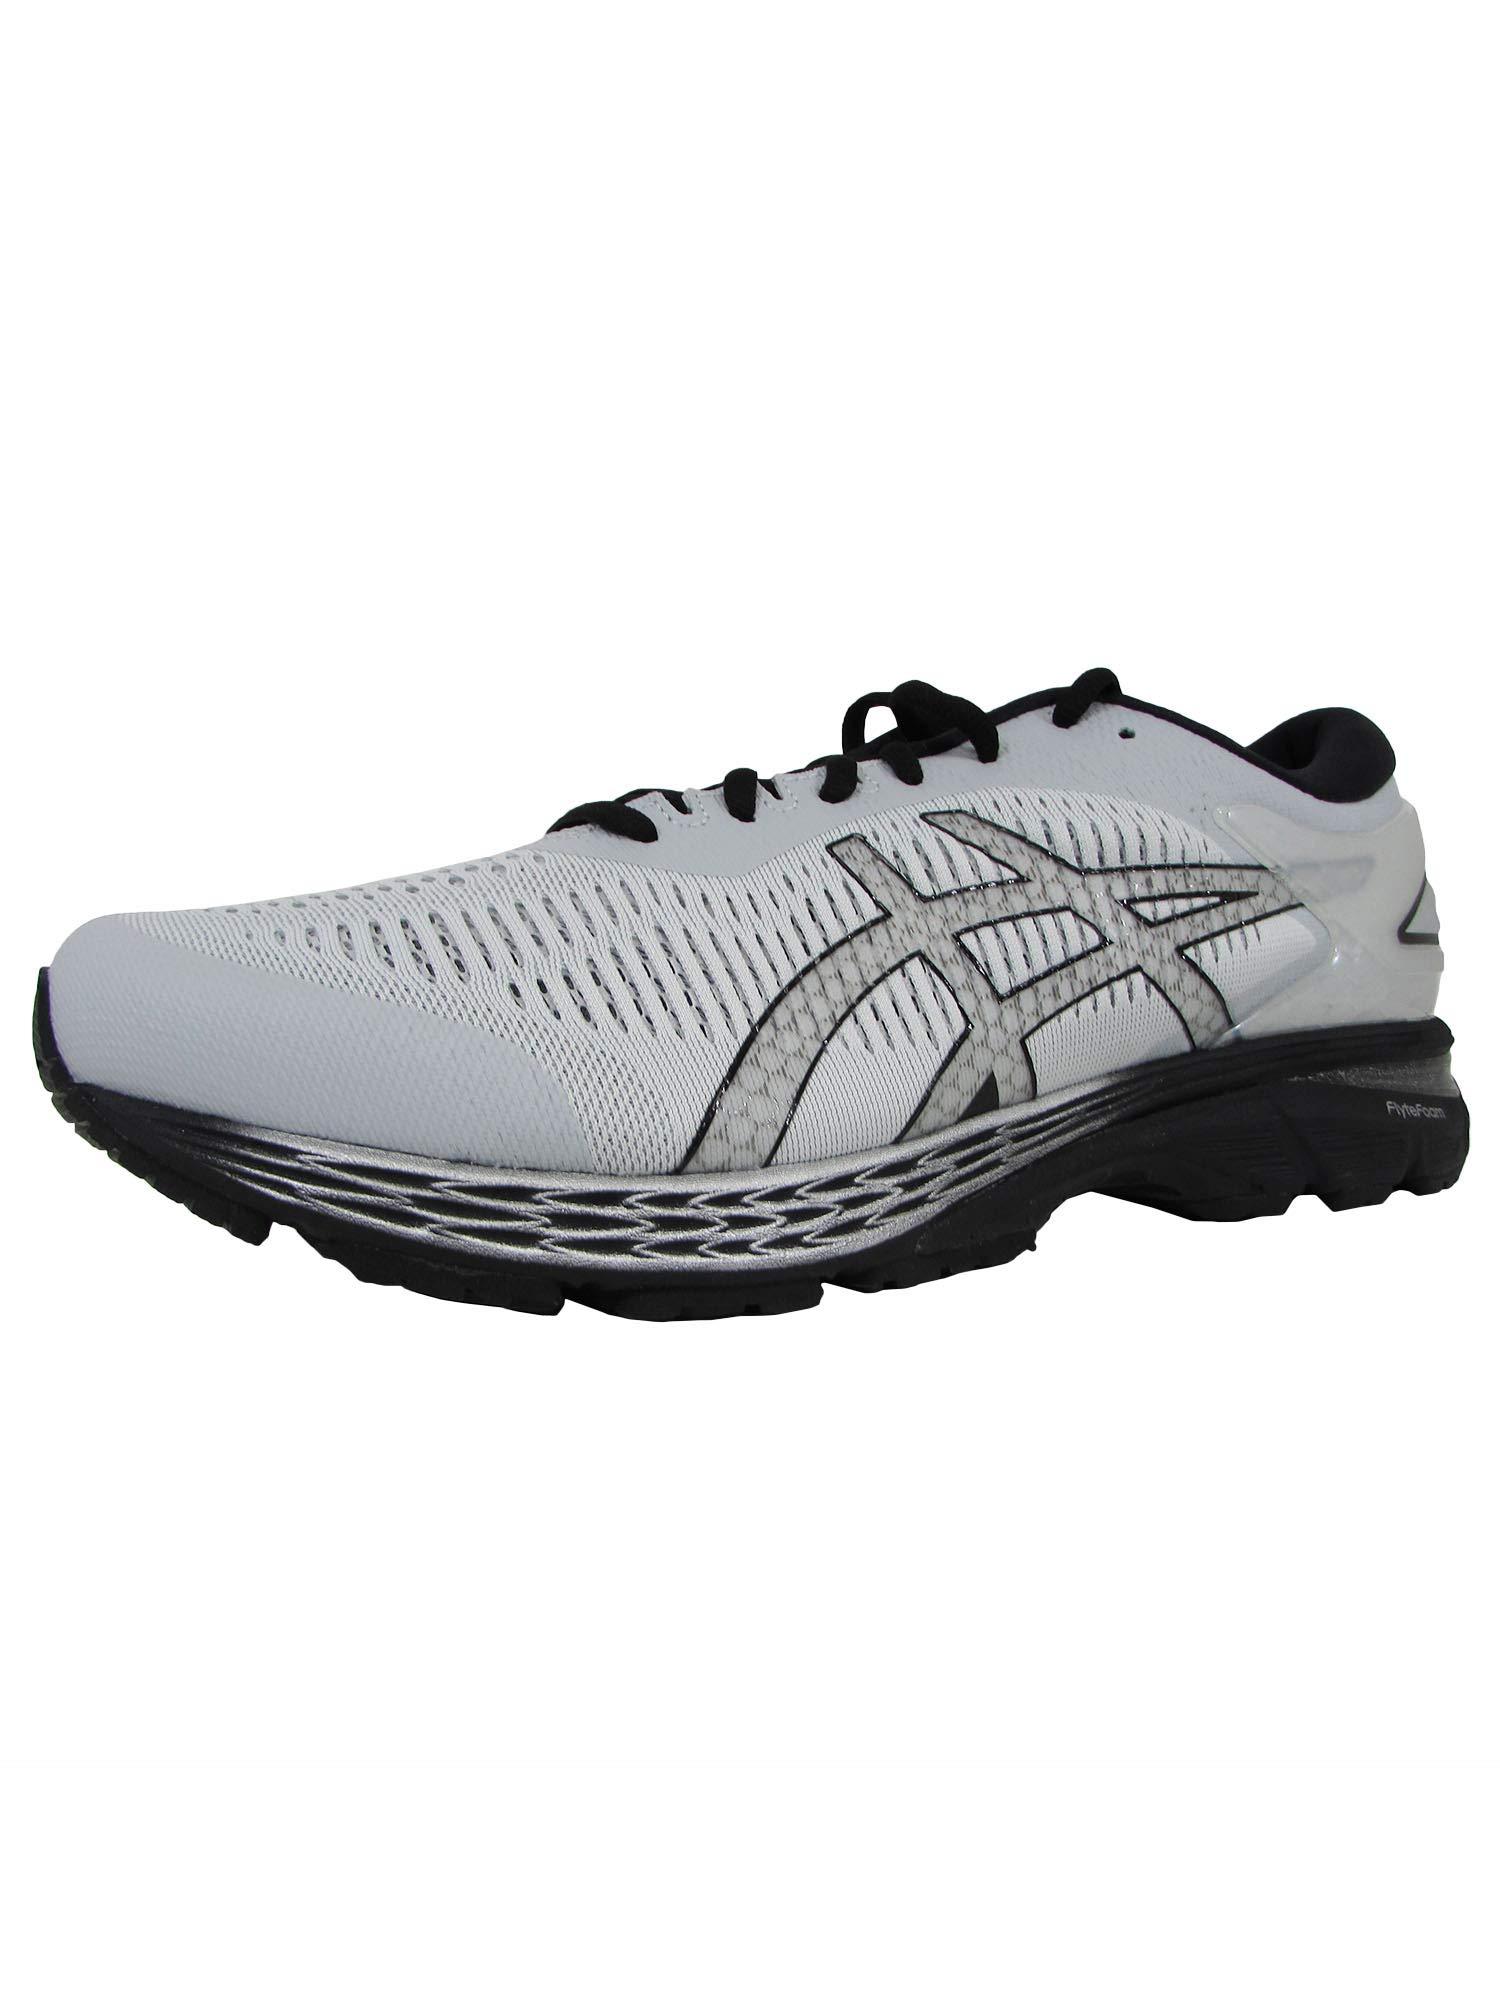 29e35a5f4d ASICS Gel-Kayano 25 Men's Running Shoe, Glacier Grey/Black, 15 4E US